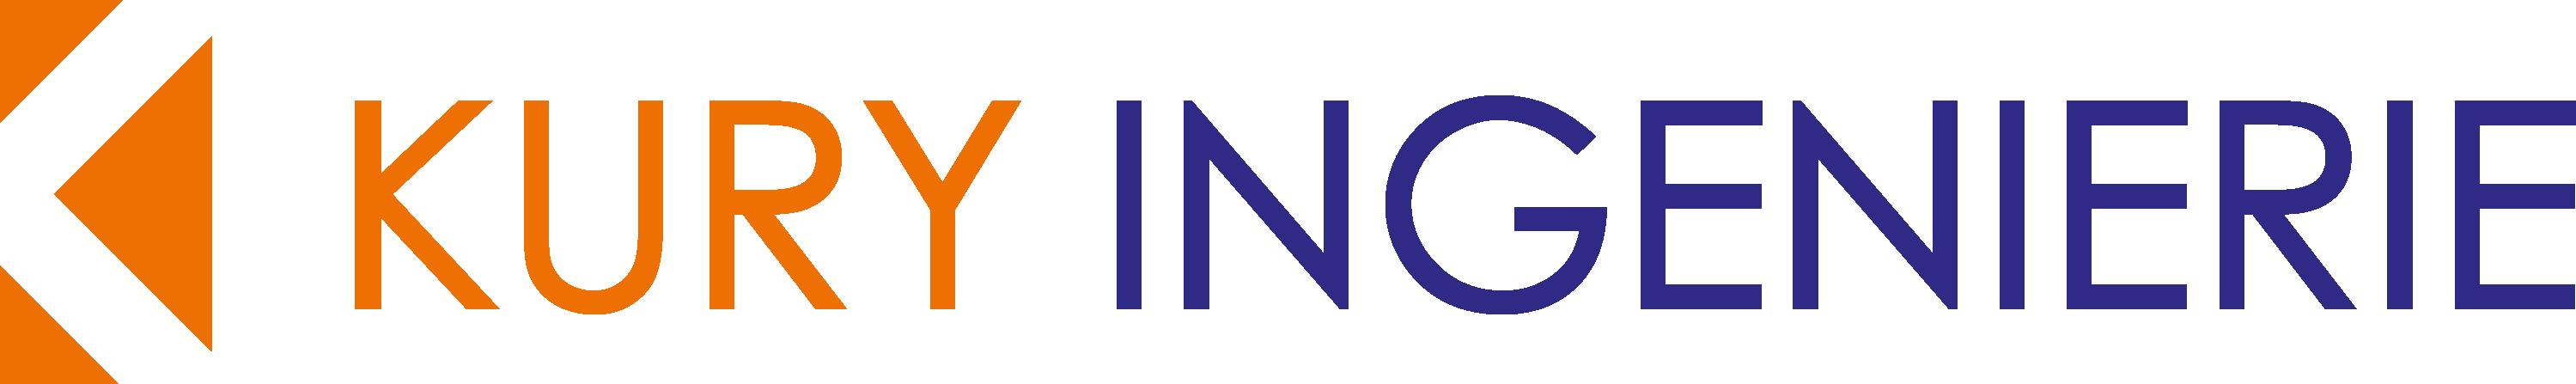 logo_kury